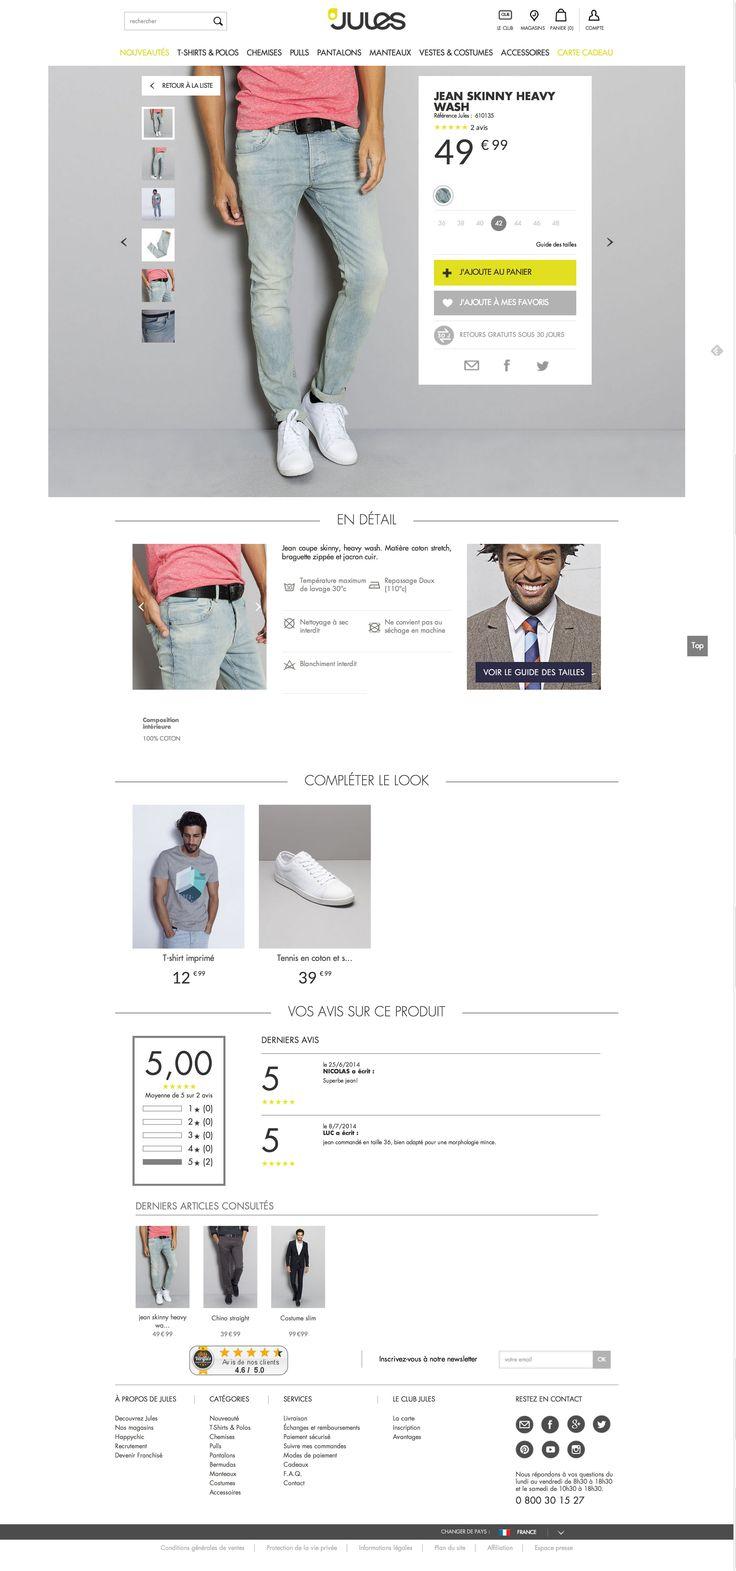 Jules product #responsive - http://www.jules.com/fr/p/jean-skinny-heavy-wash-610135.html?dwvar_610135_color=1200#cgid=M2&start=1